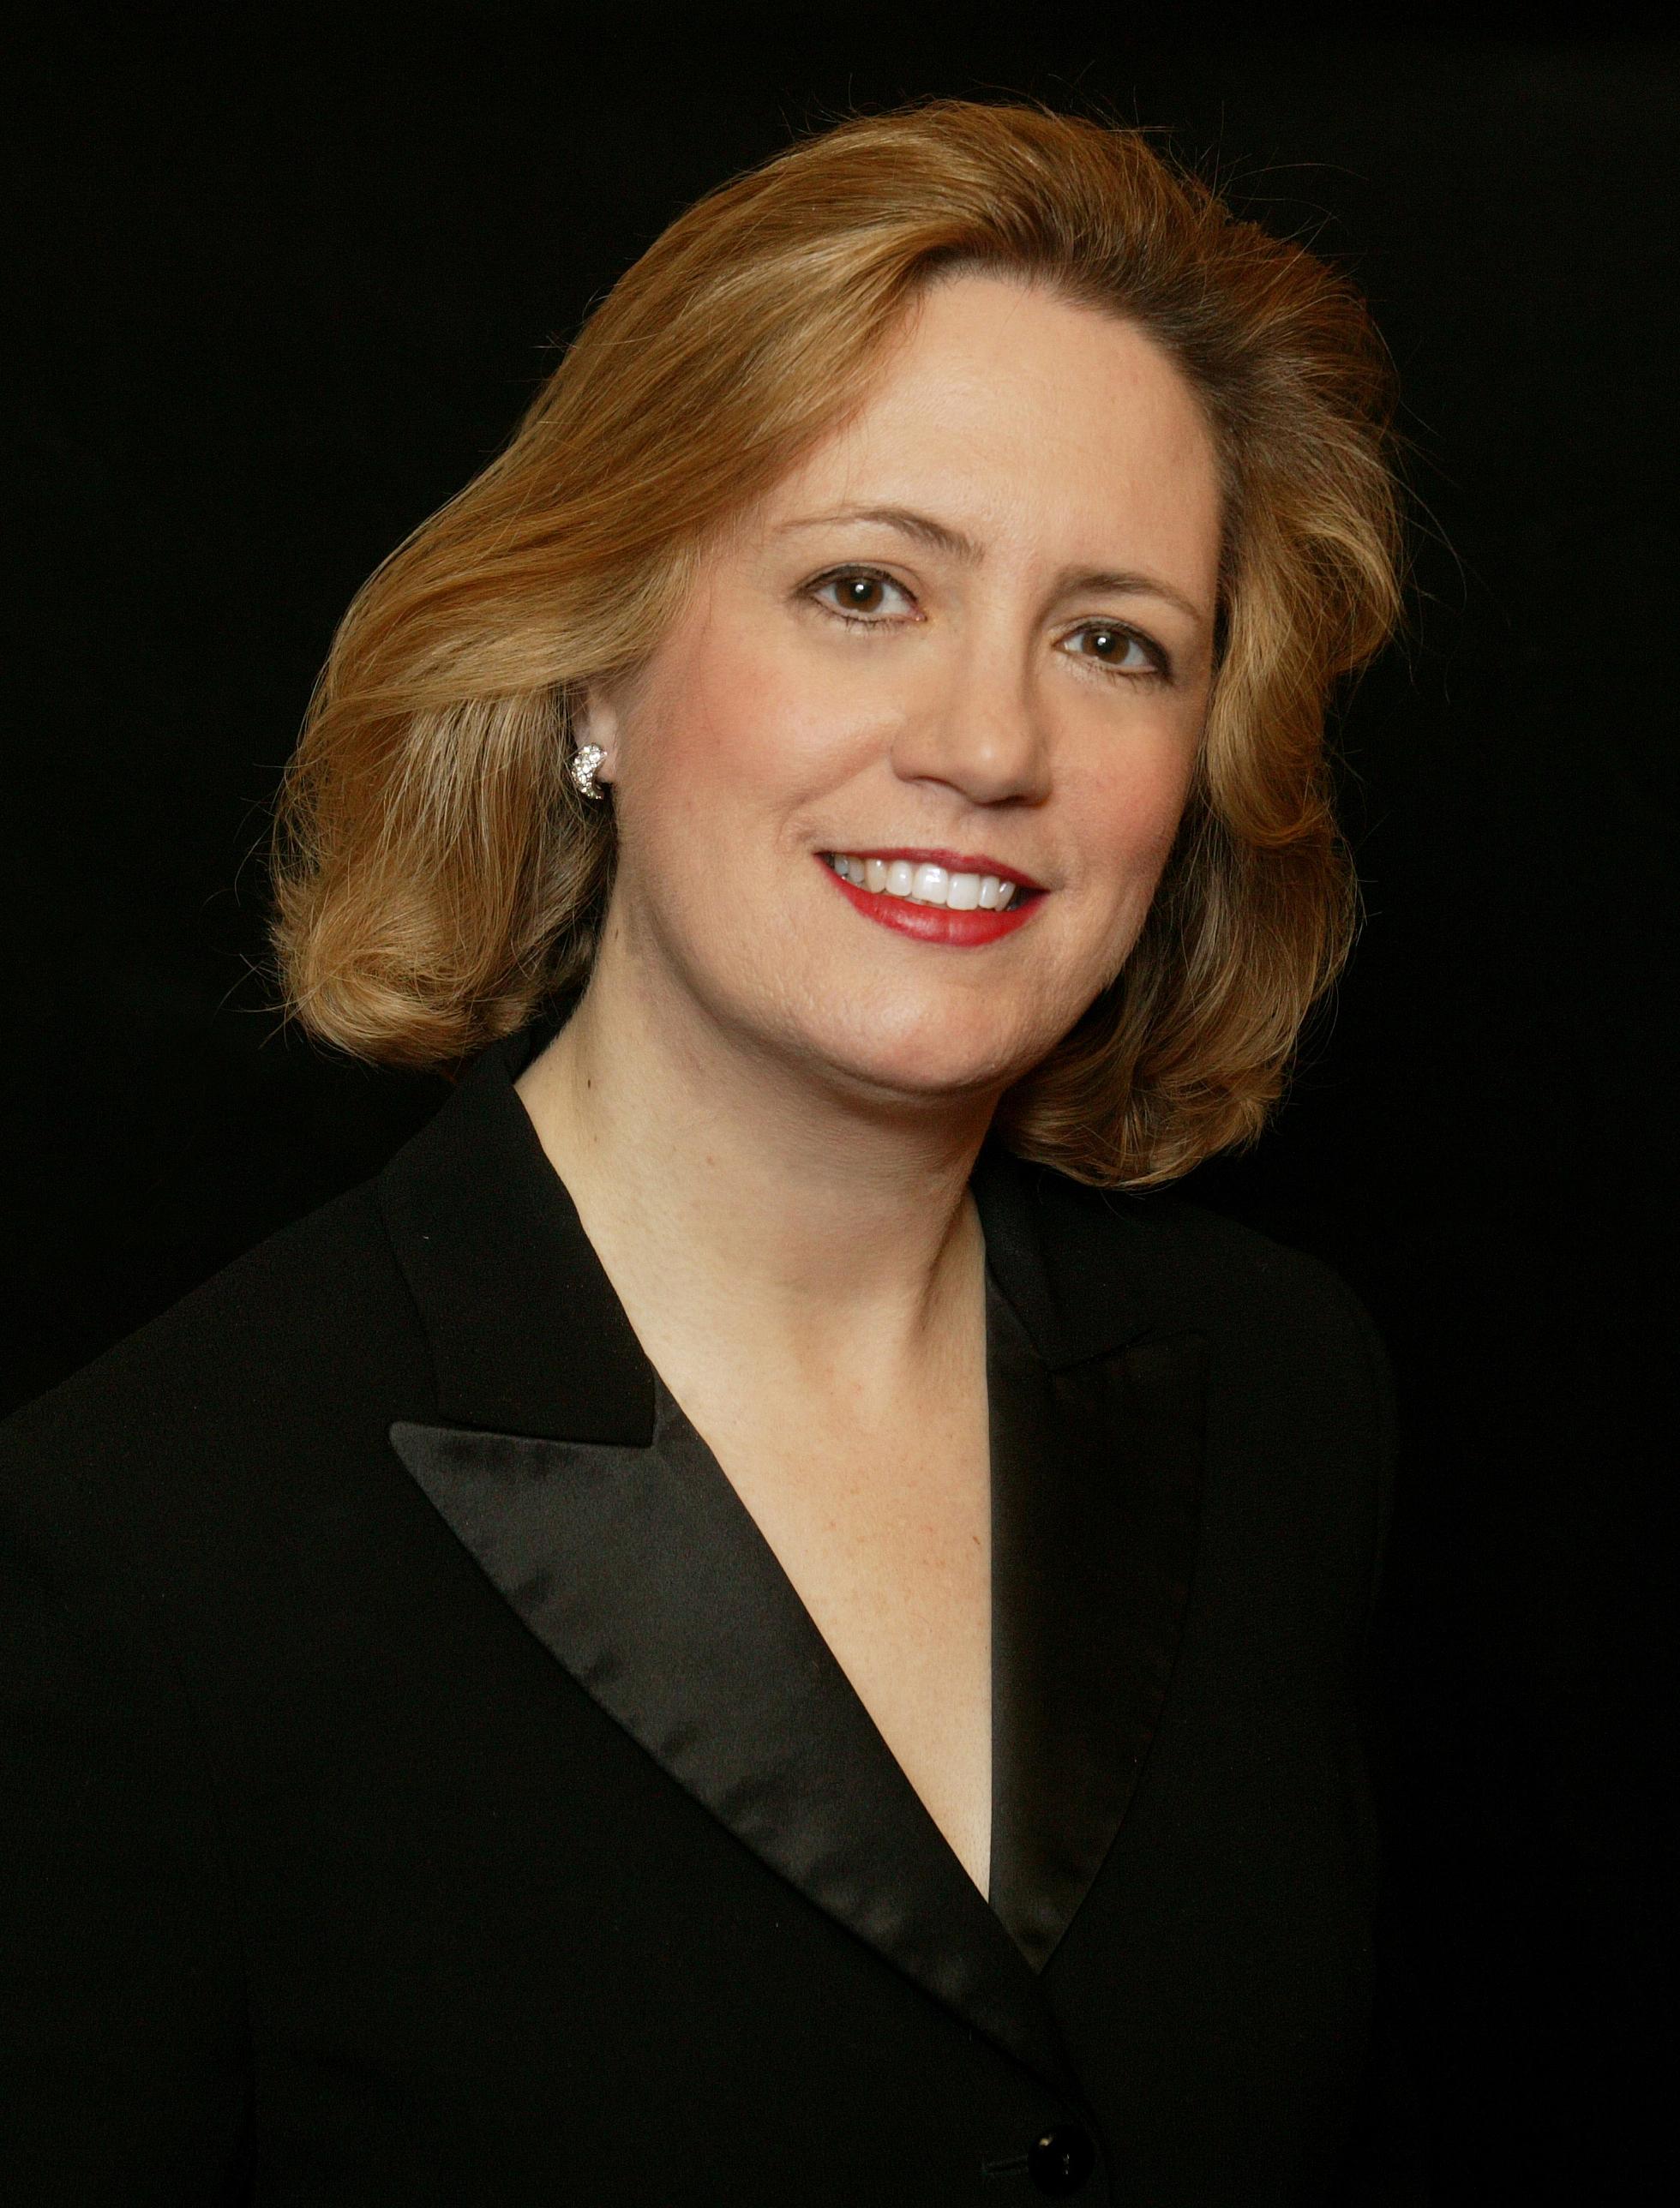 Elizabeth Schulze